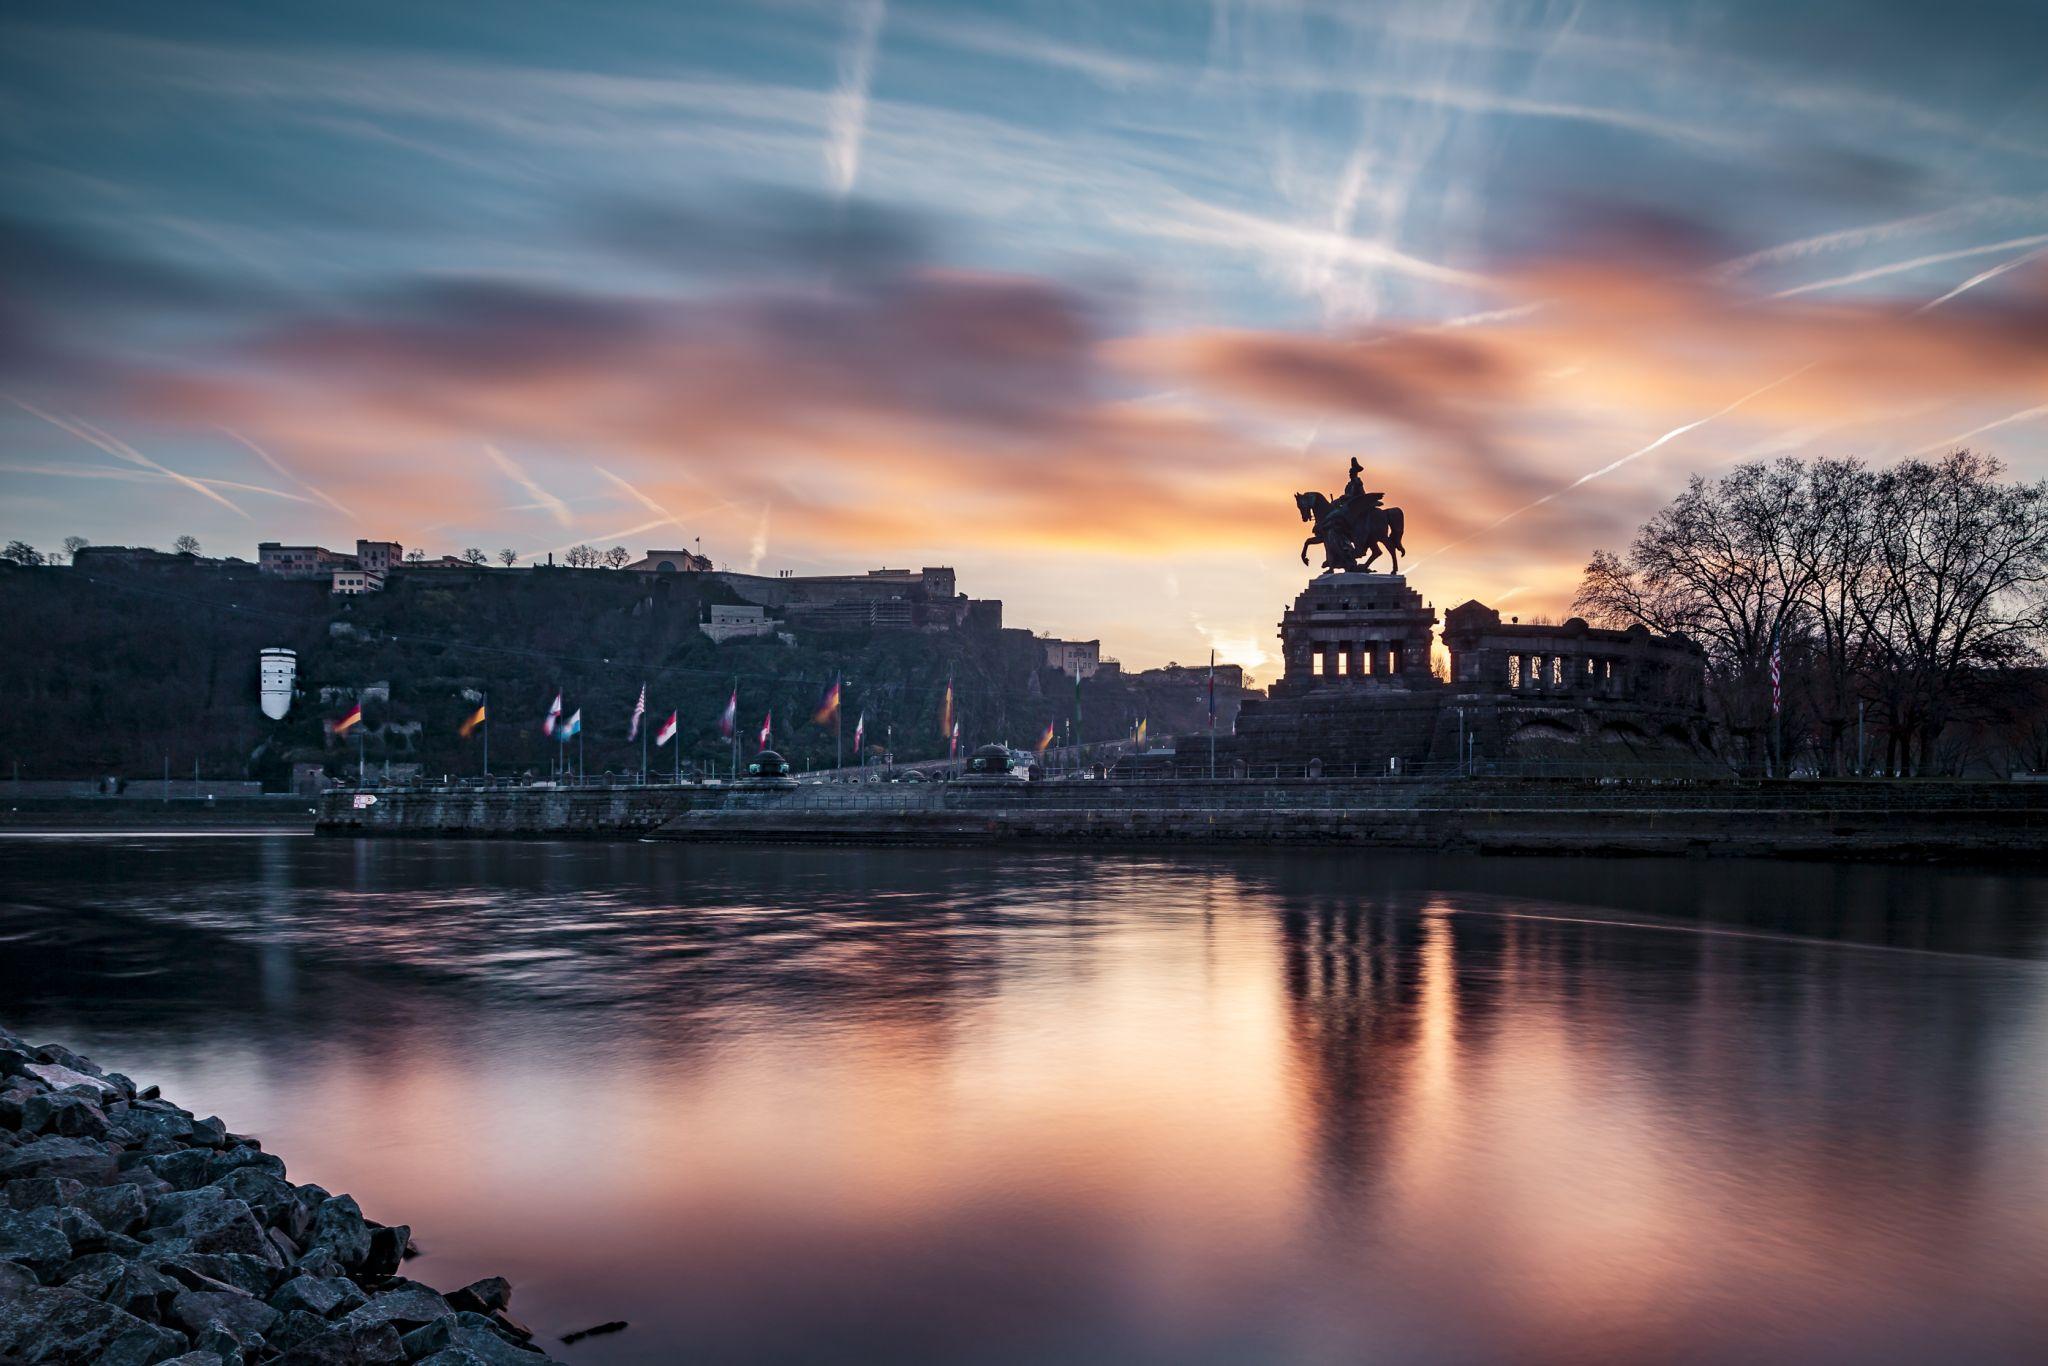 Der Reiter, Koblenz, Germany